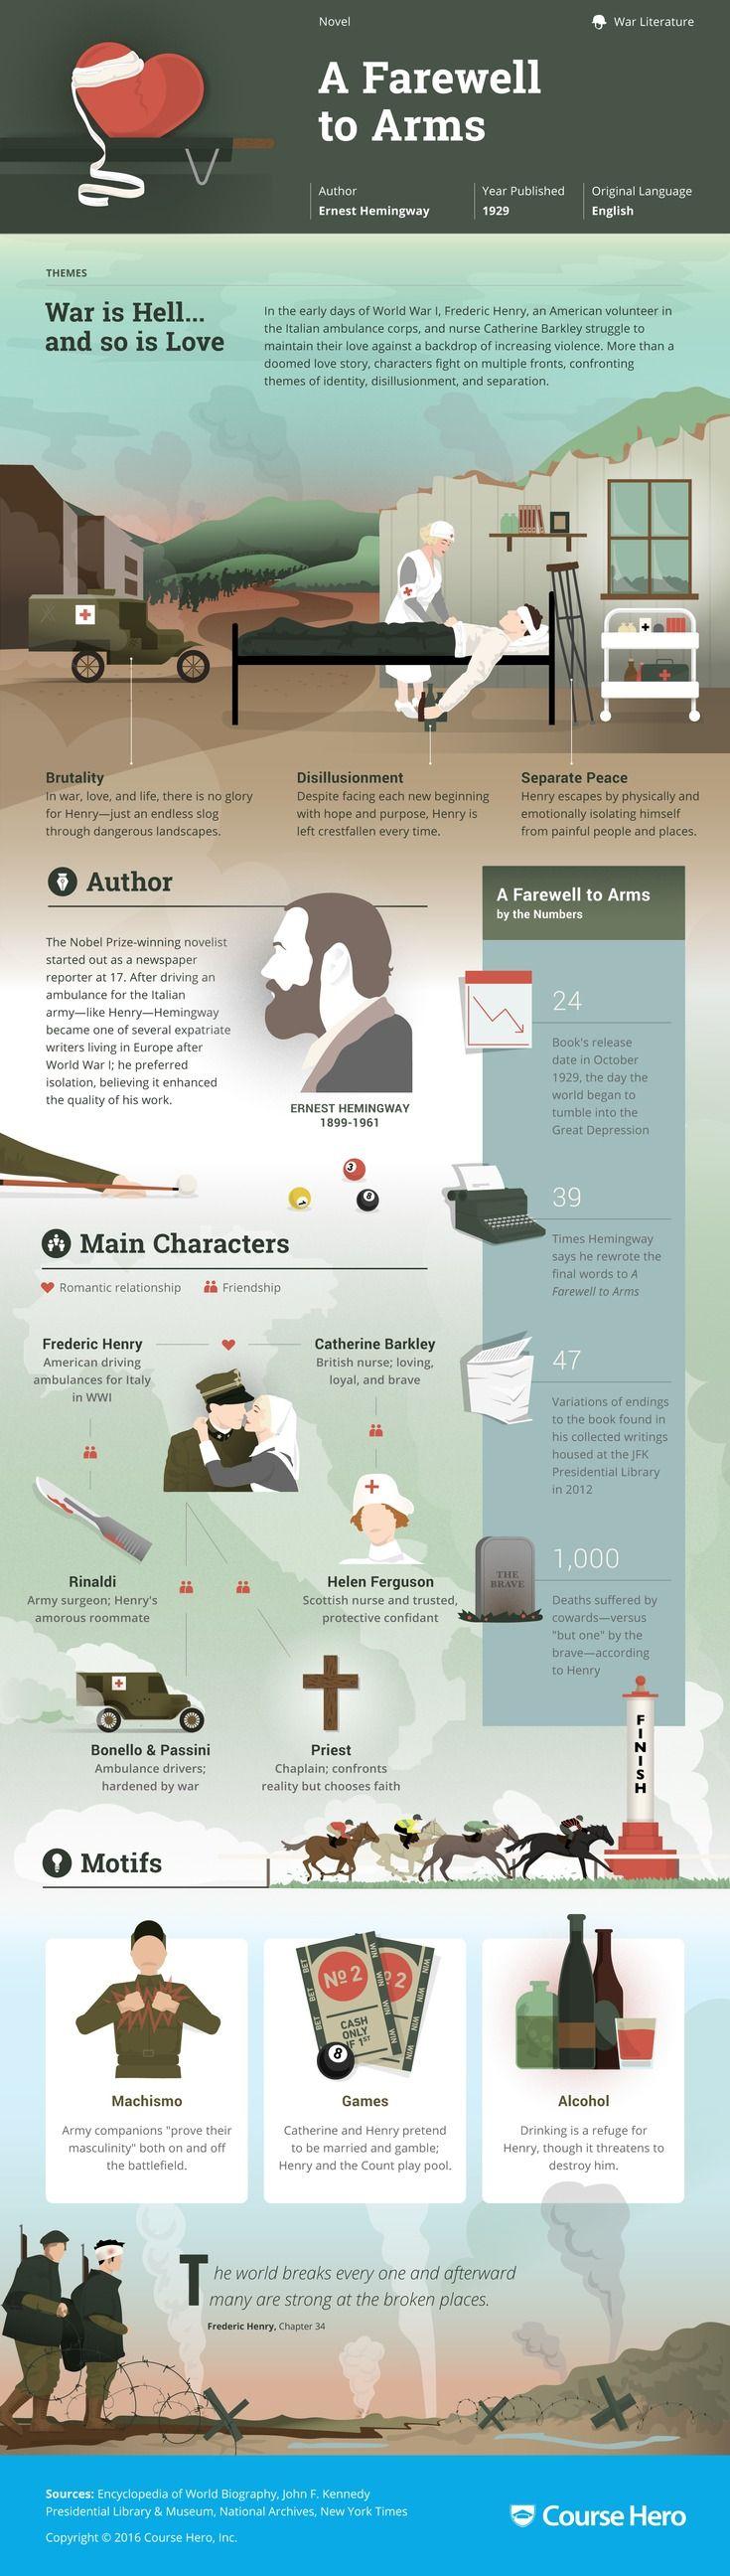 25+ Best Ideas About Hemingway Novels On Pinterest  Ernest Hemingway Short  Stories, Ideas For Short Stories And Short Stories